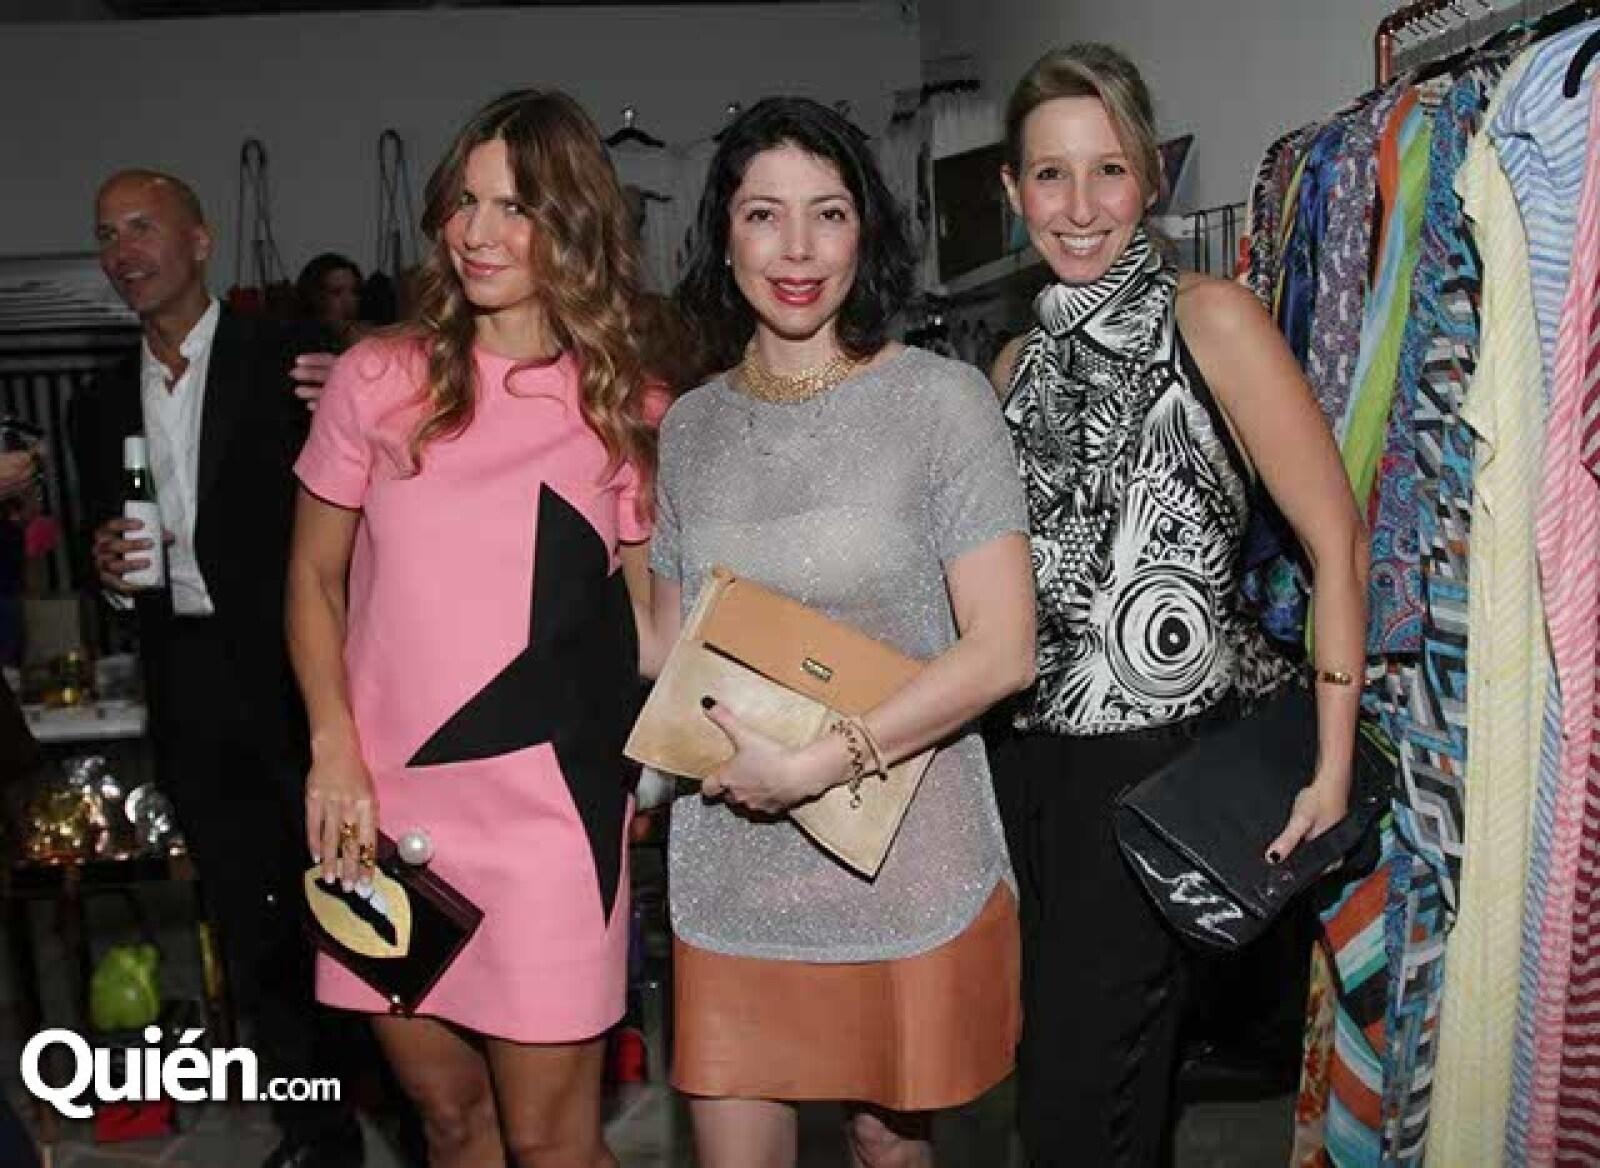 Ana Alexandra Henrique,Ana Sofía Tarbay y Sigal Cohen